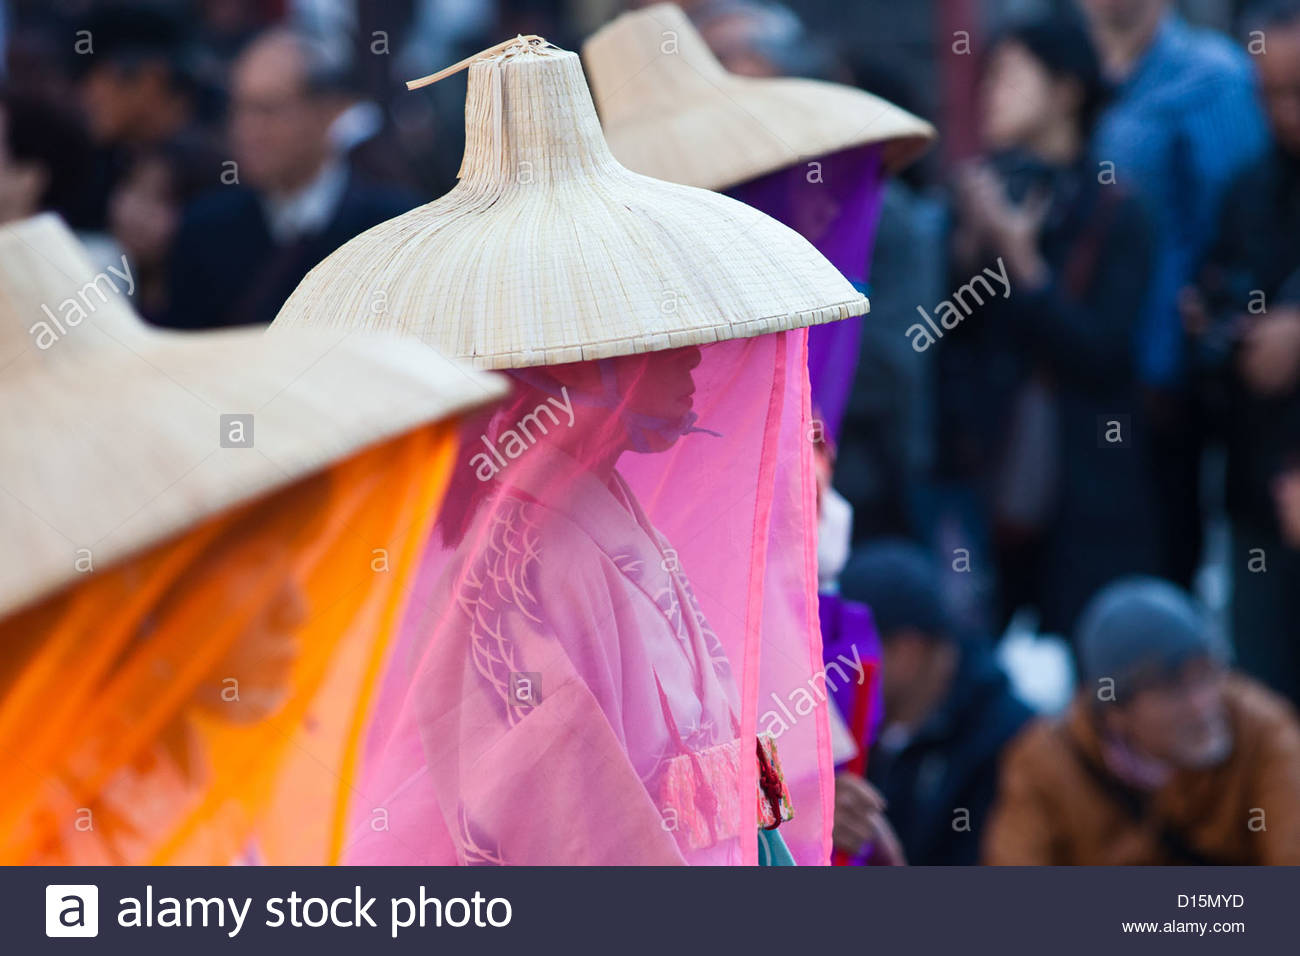 Women with colourful veils walk in the Jidai matsuri parade through Asakusa, Tokyo. Stock Photo